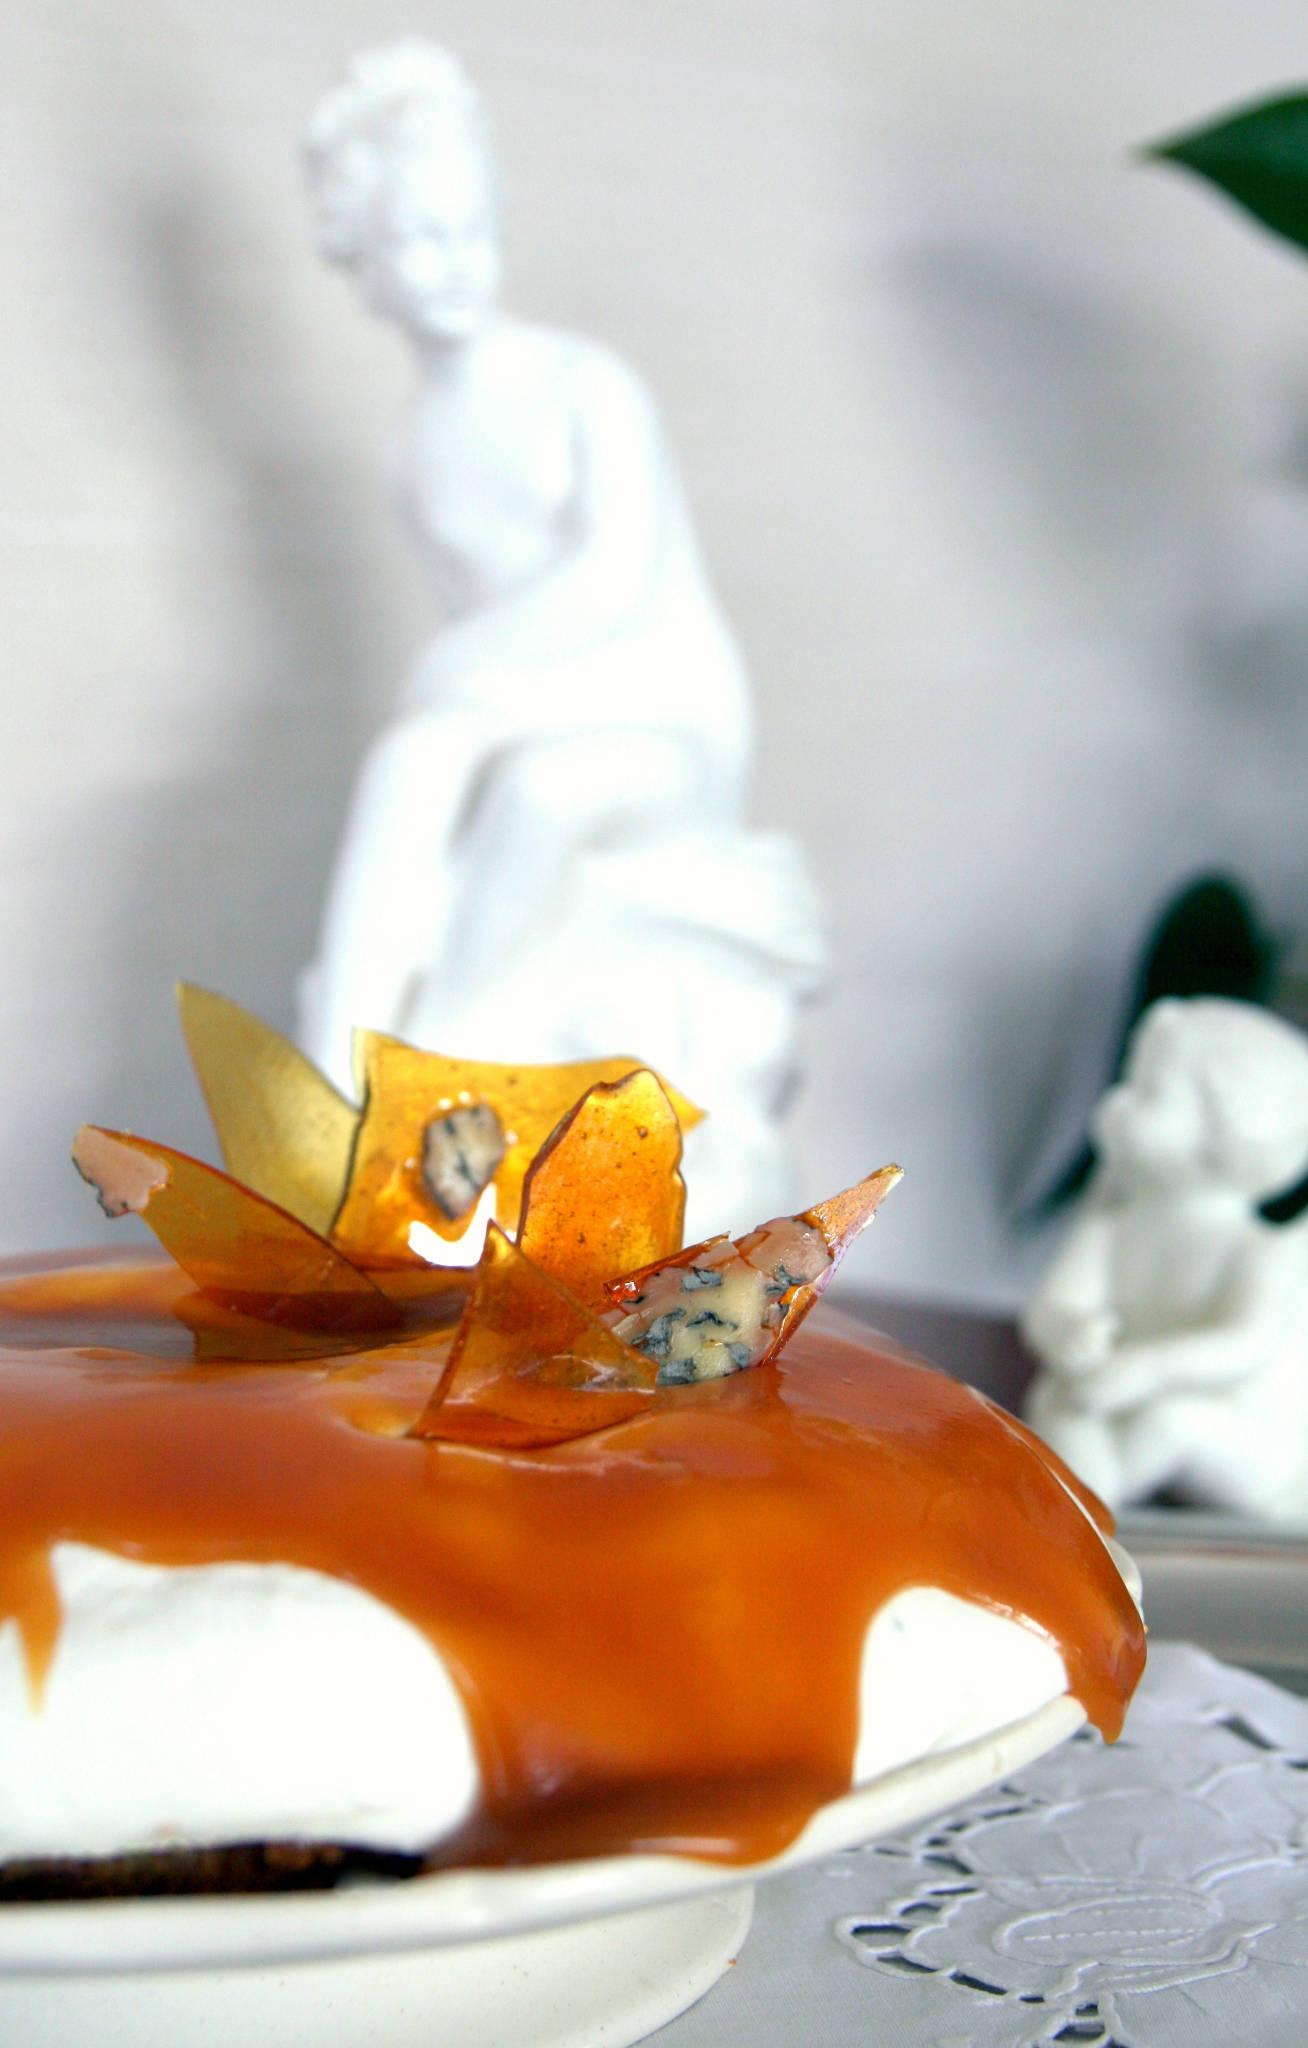 Cheesecake à la Fourme d'Ambert et au caramel